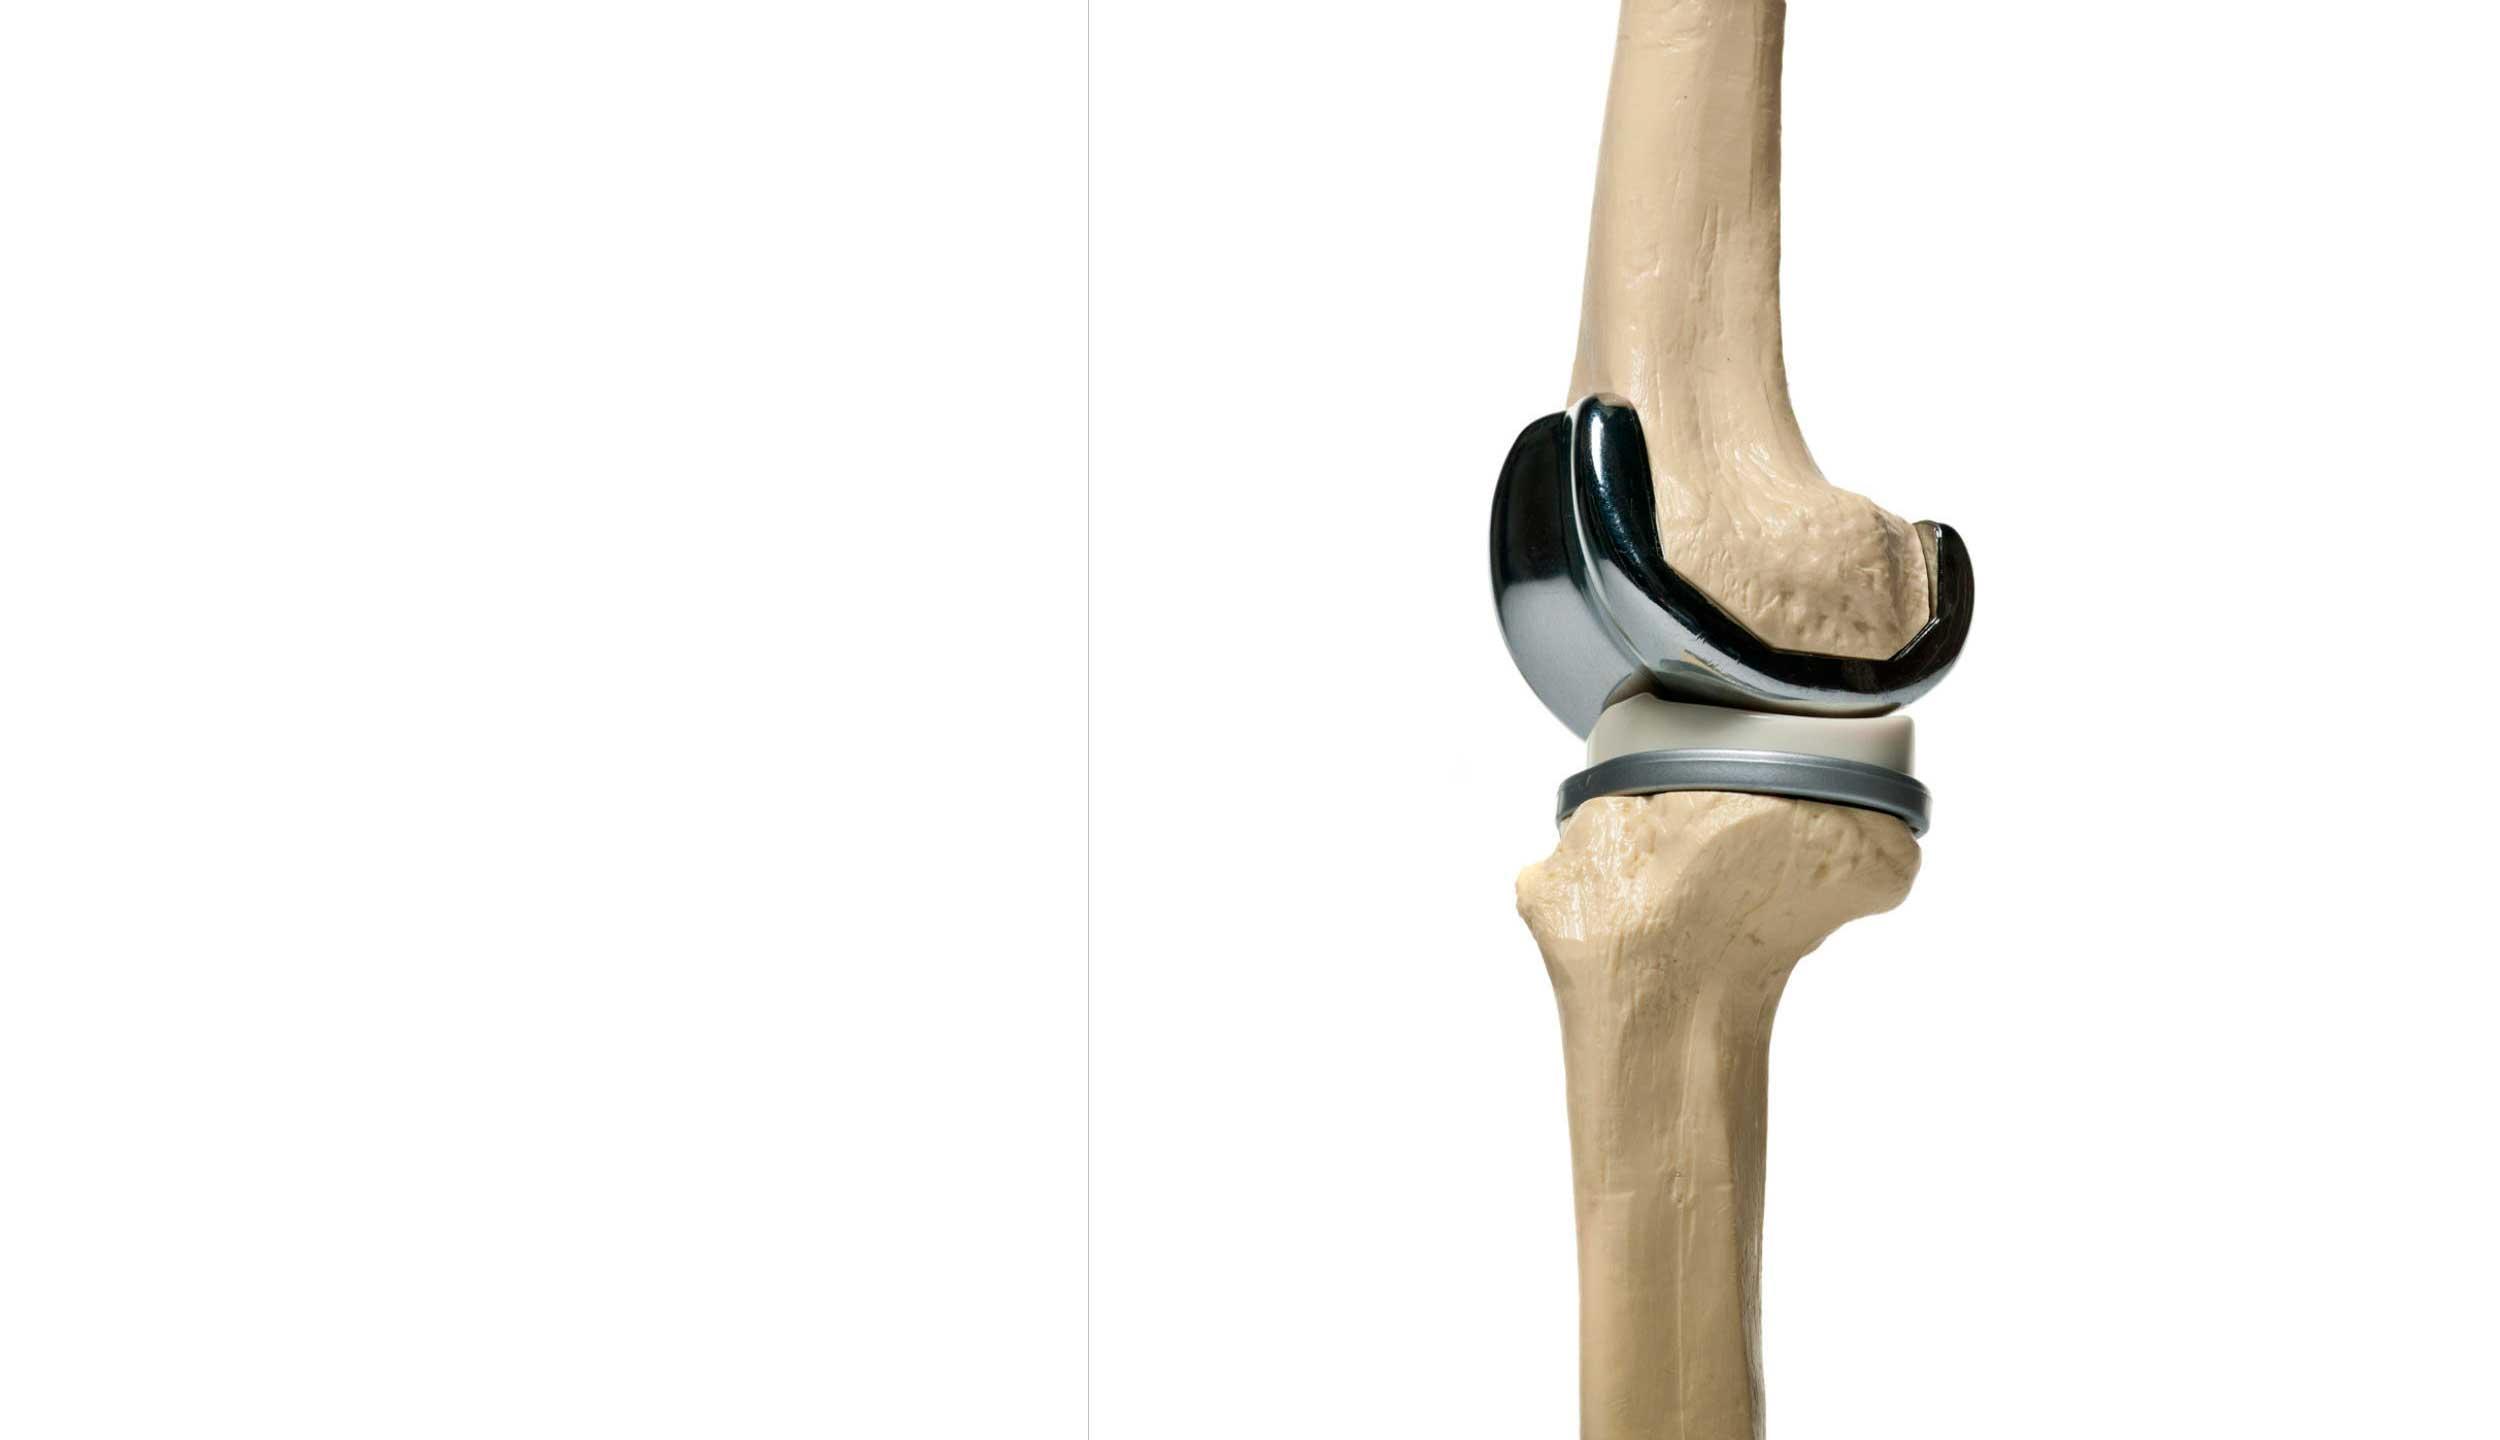 Rodilla protesis